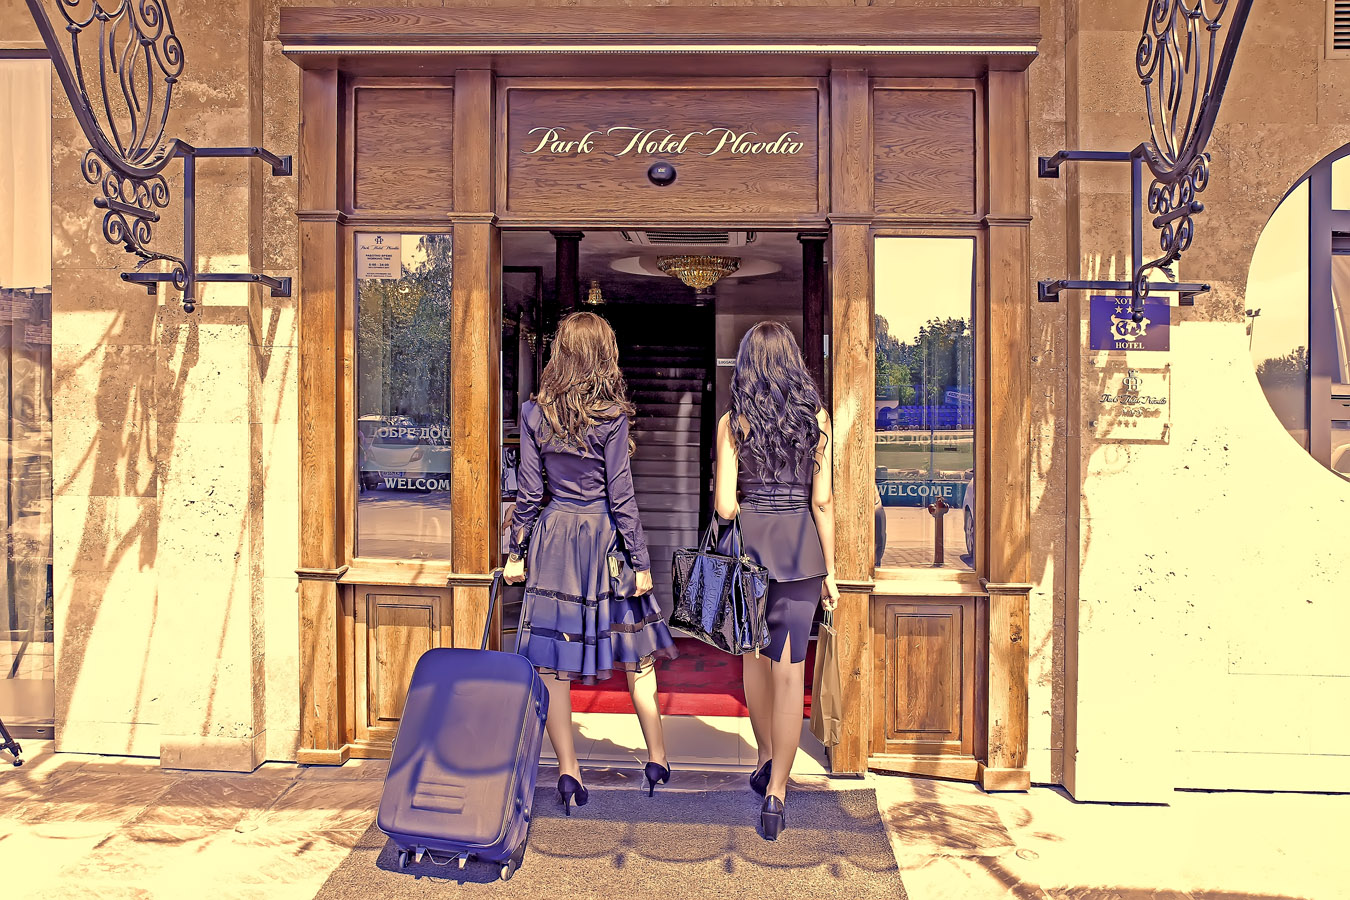 Park Hotel Plovdiv Visitplovdiv Com